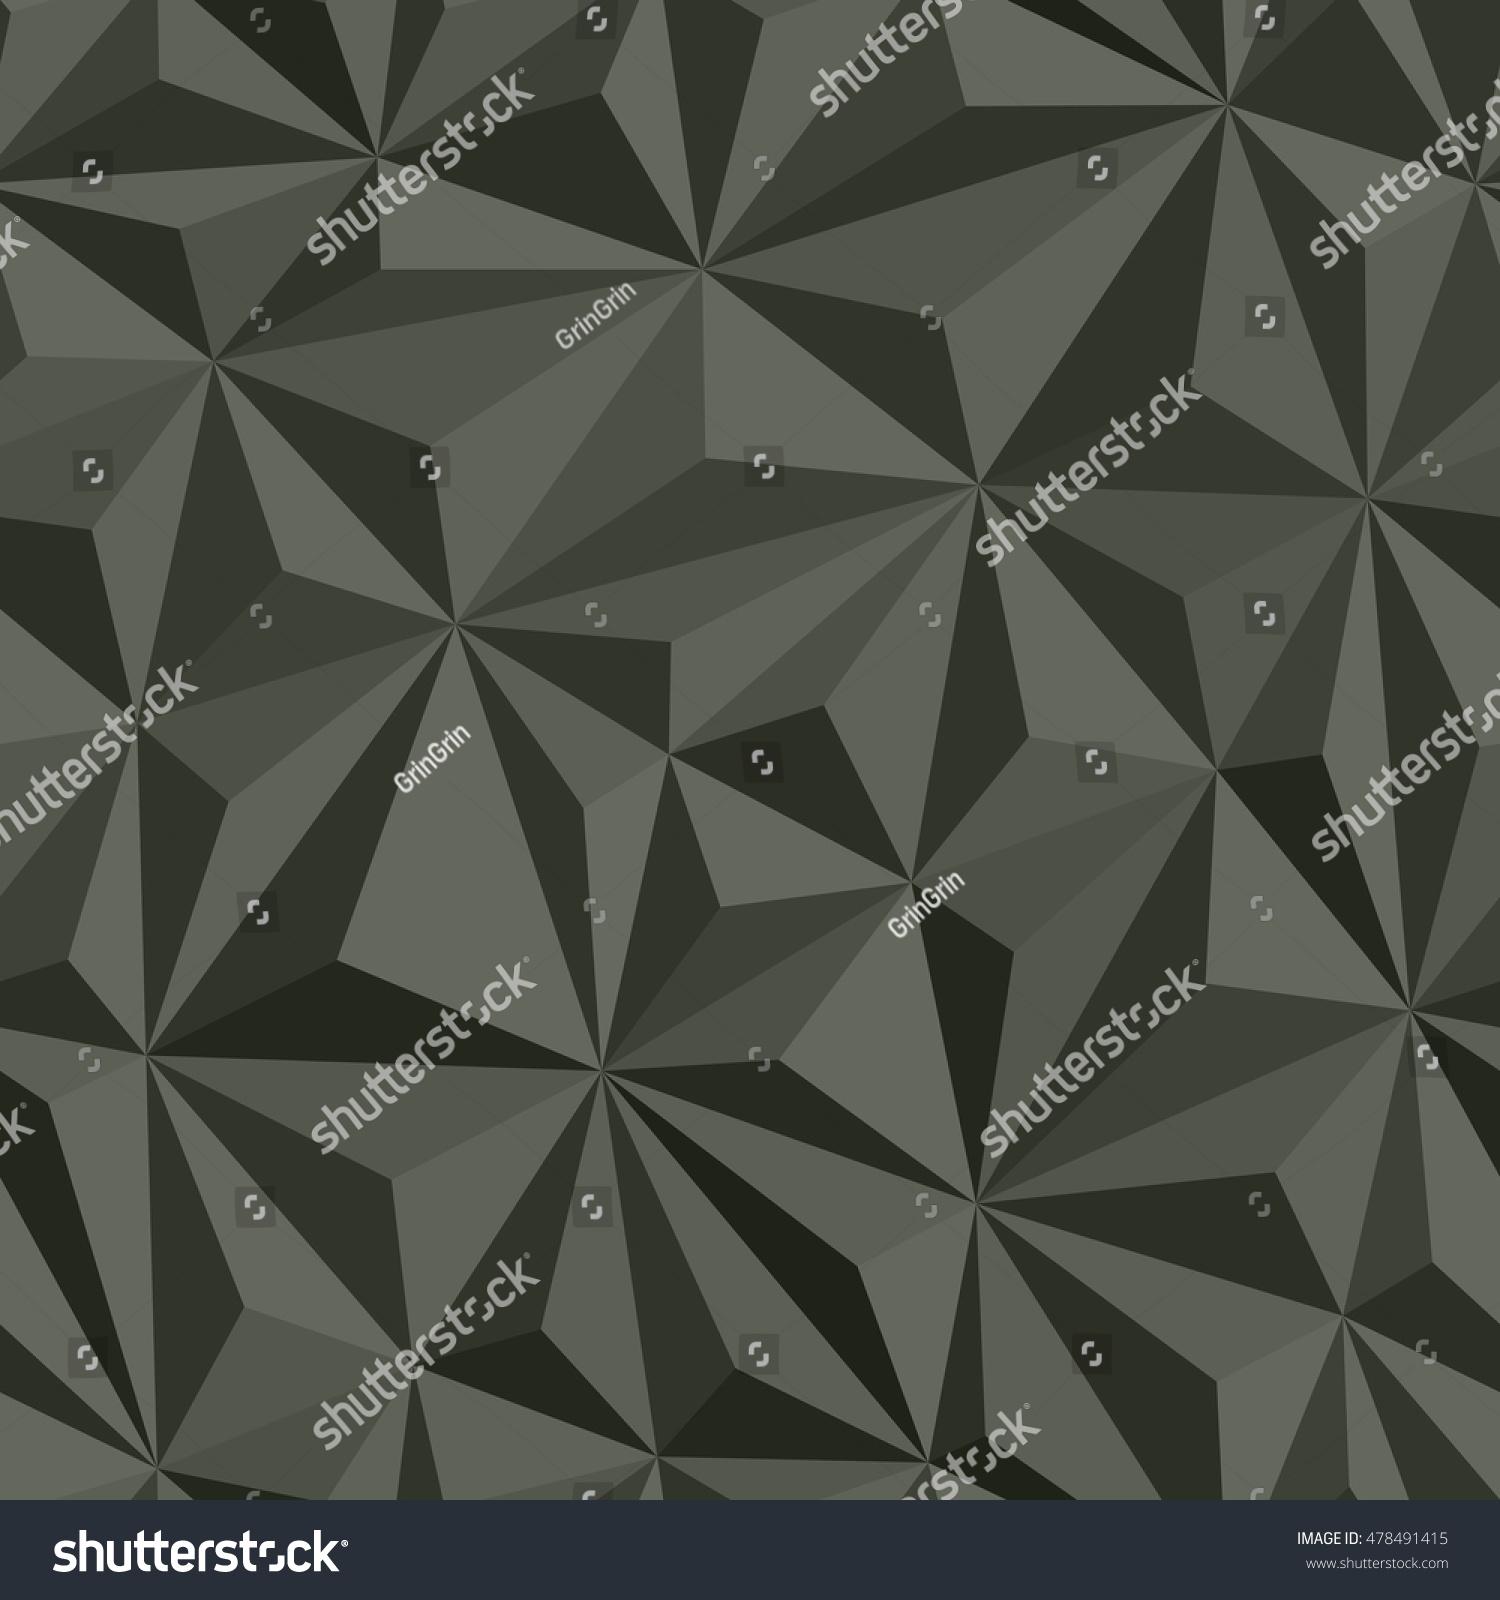 Vector Abstract Dark Grey Seamless Pattern Volumetric Triangle Texture Shards Modern Dynamic